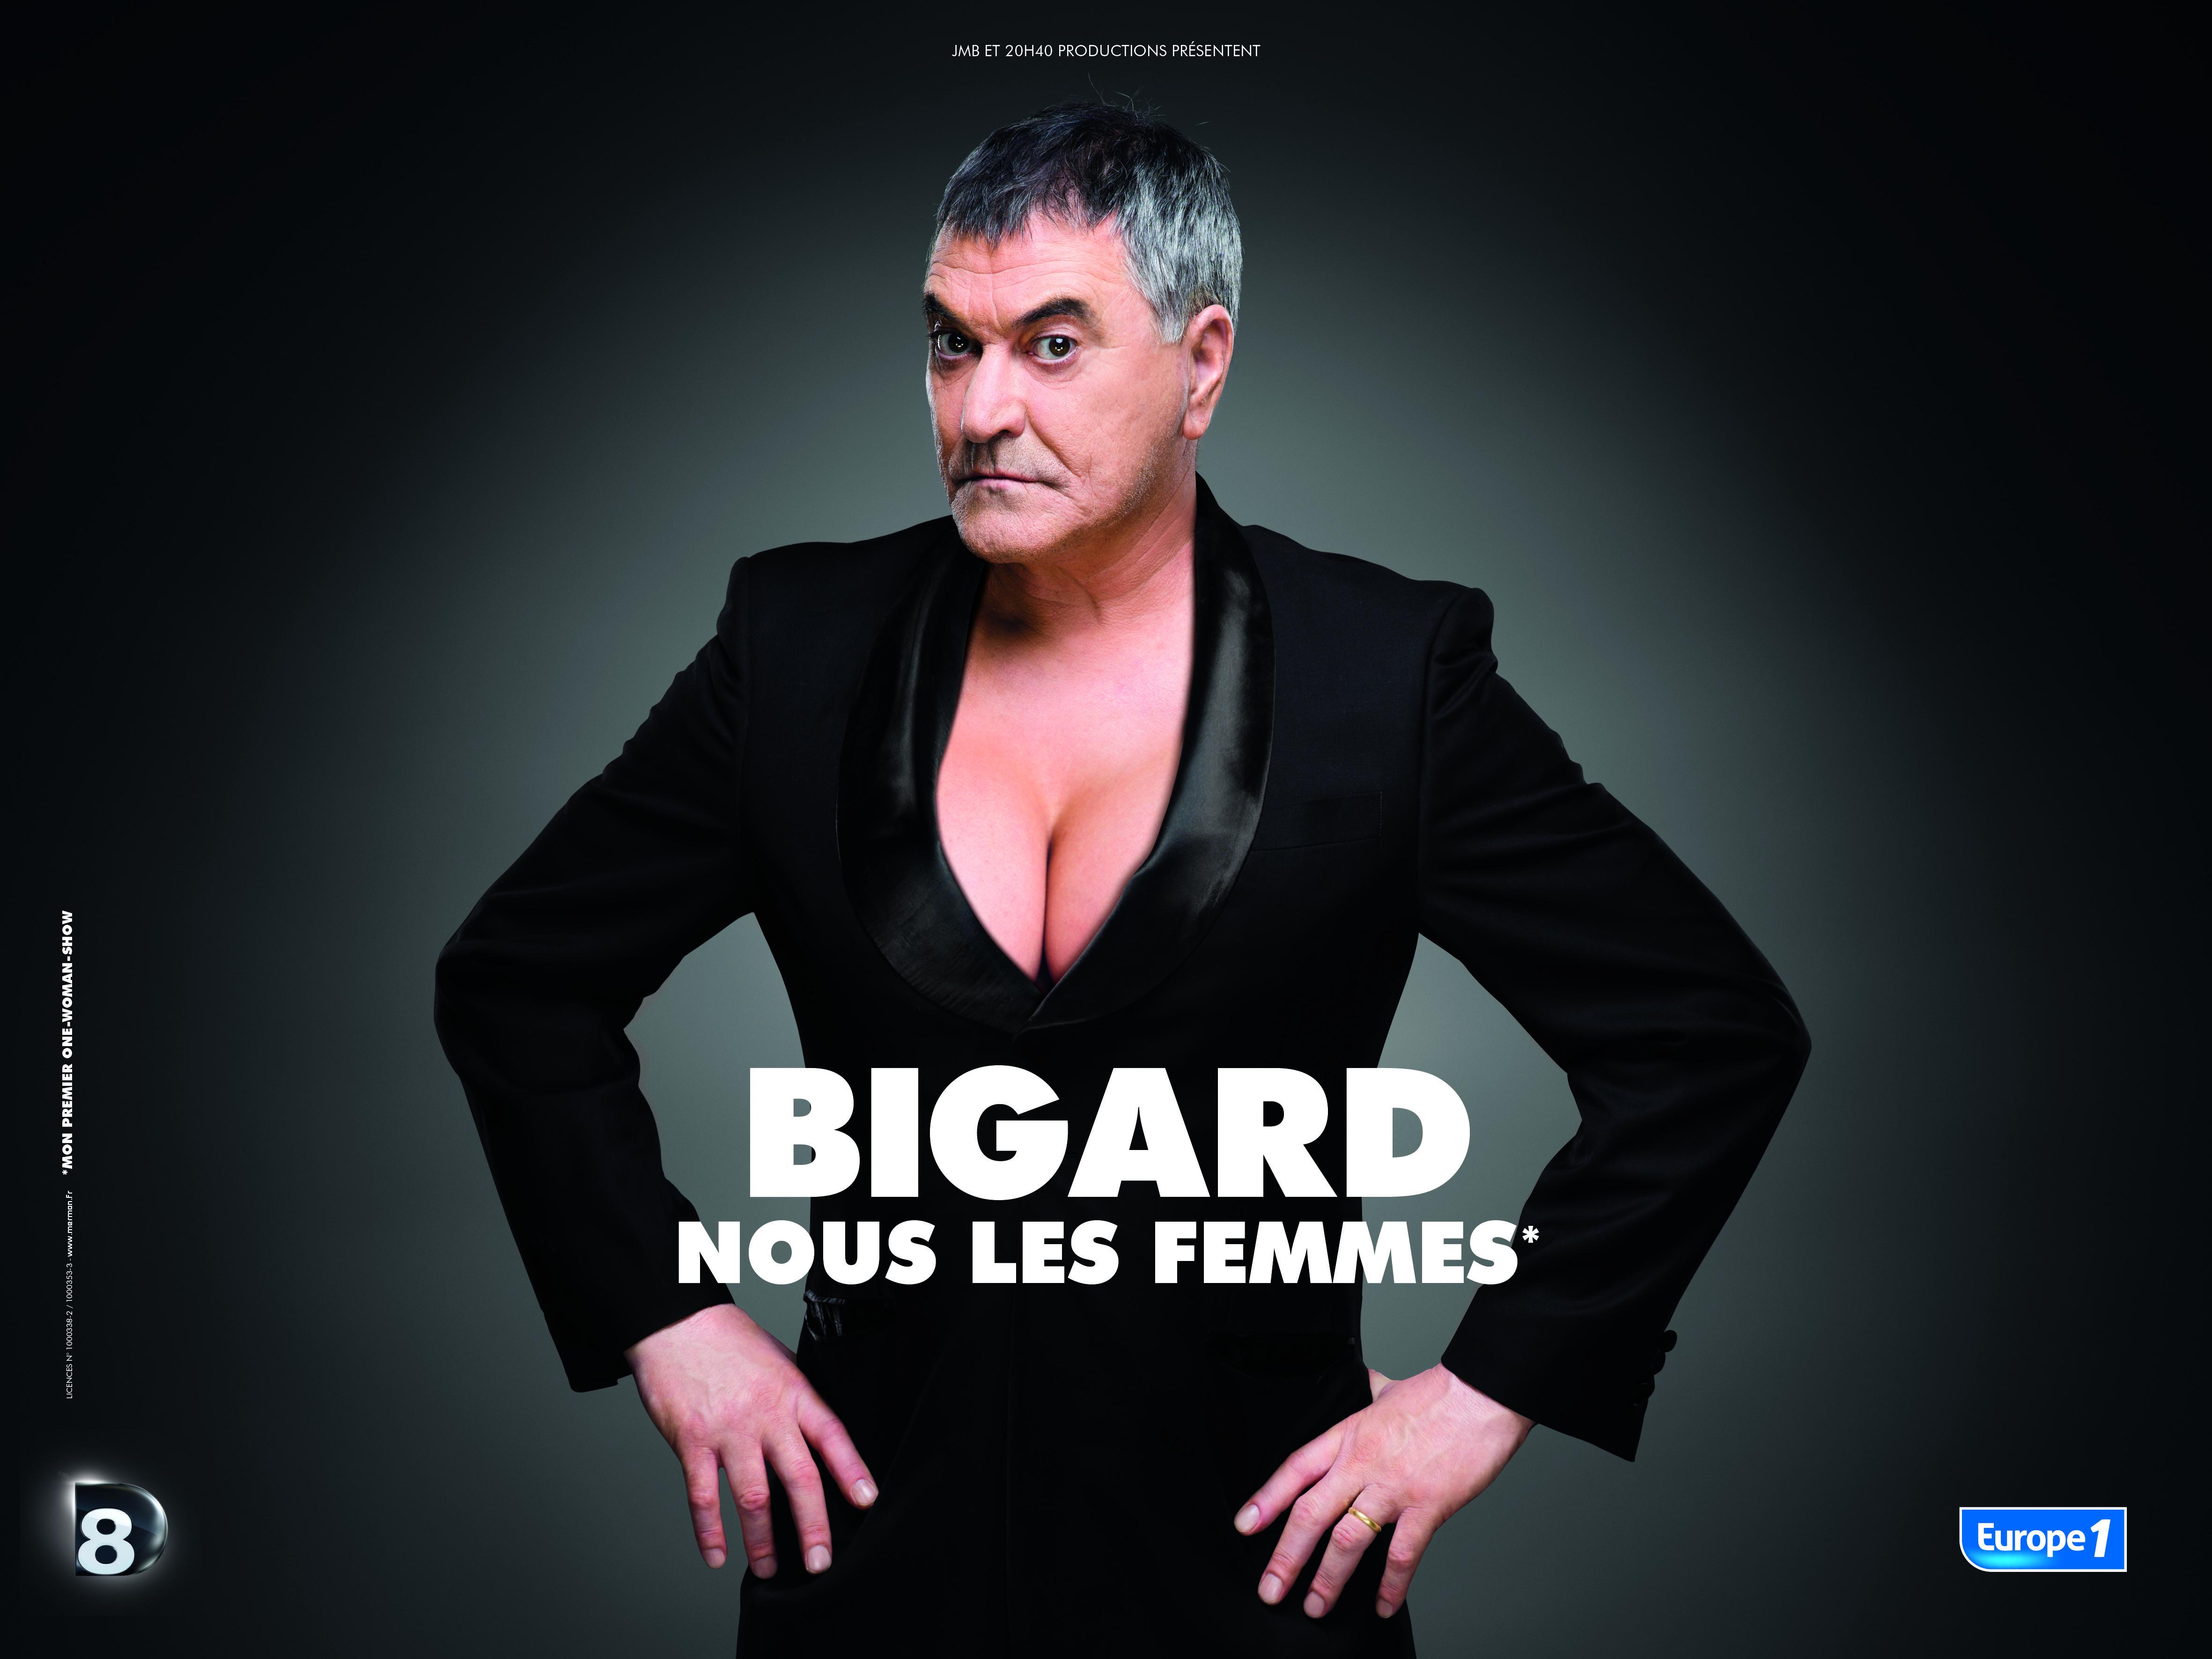 bigard-tournee-4x3-presse